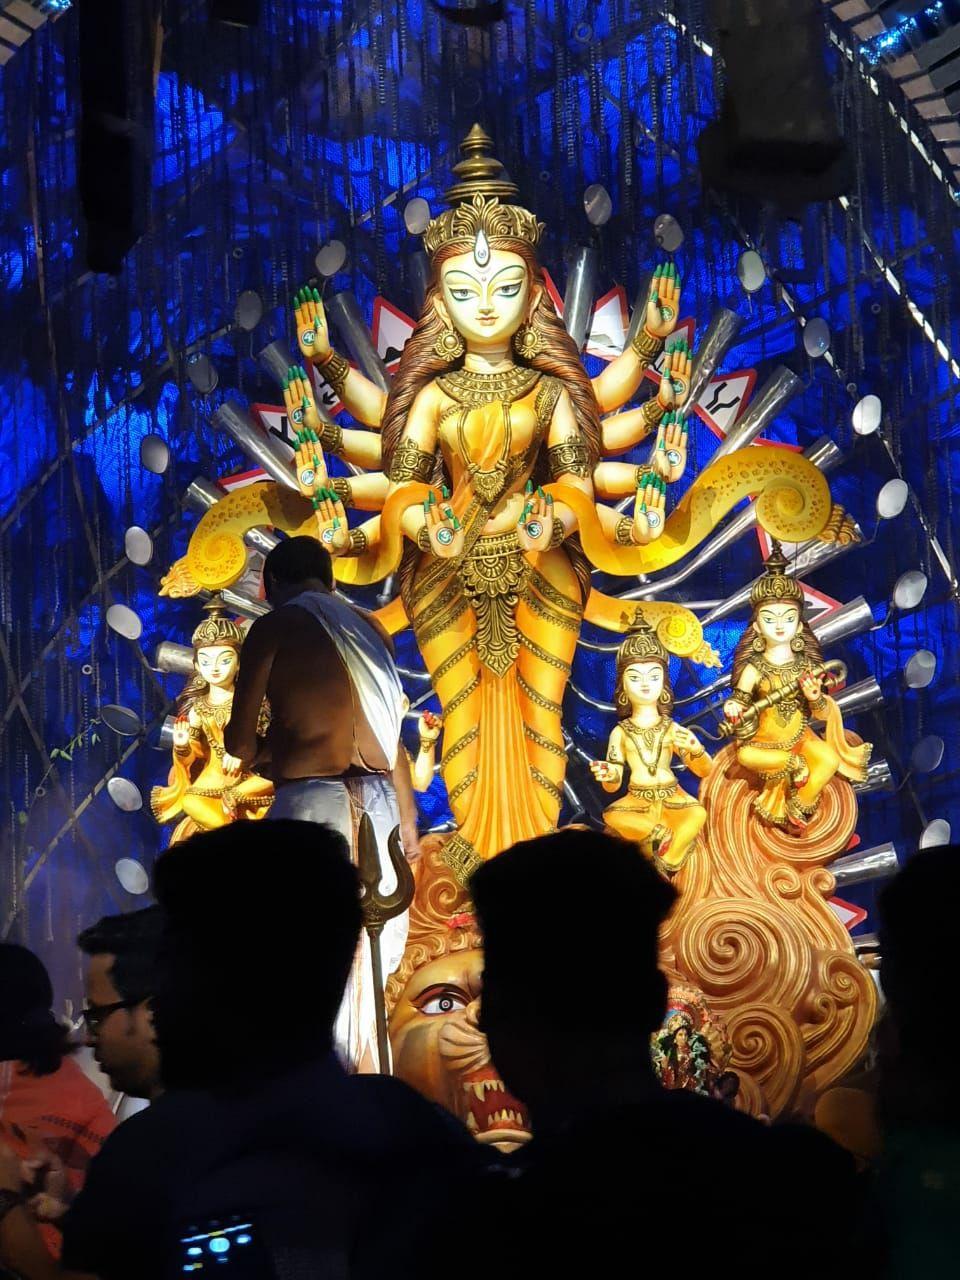 Photo of Kolkata By Subhajit Das